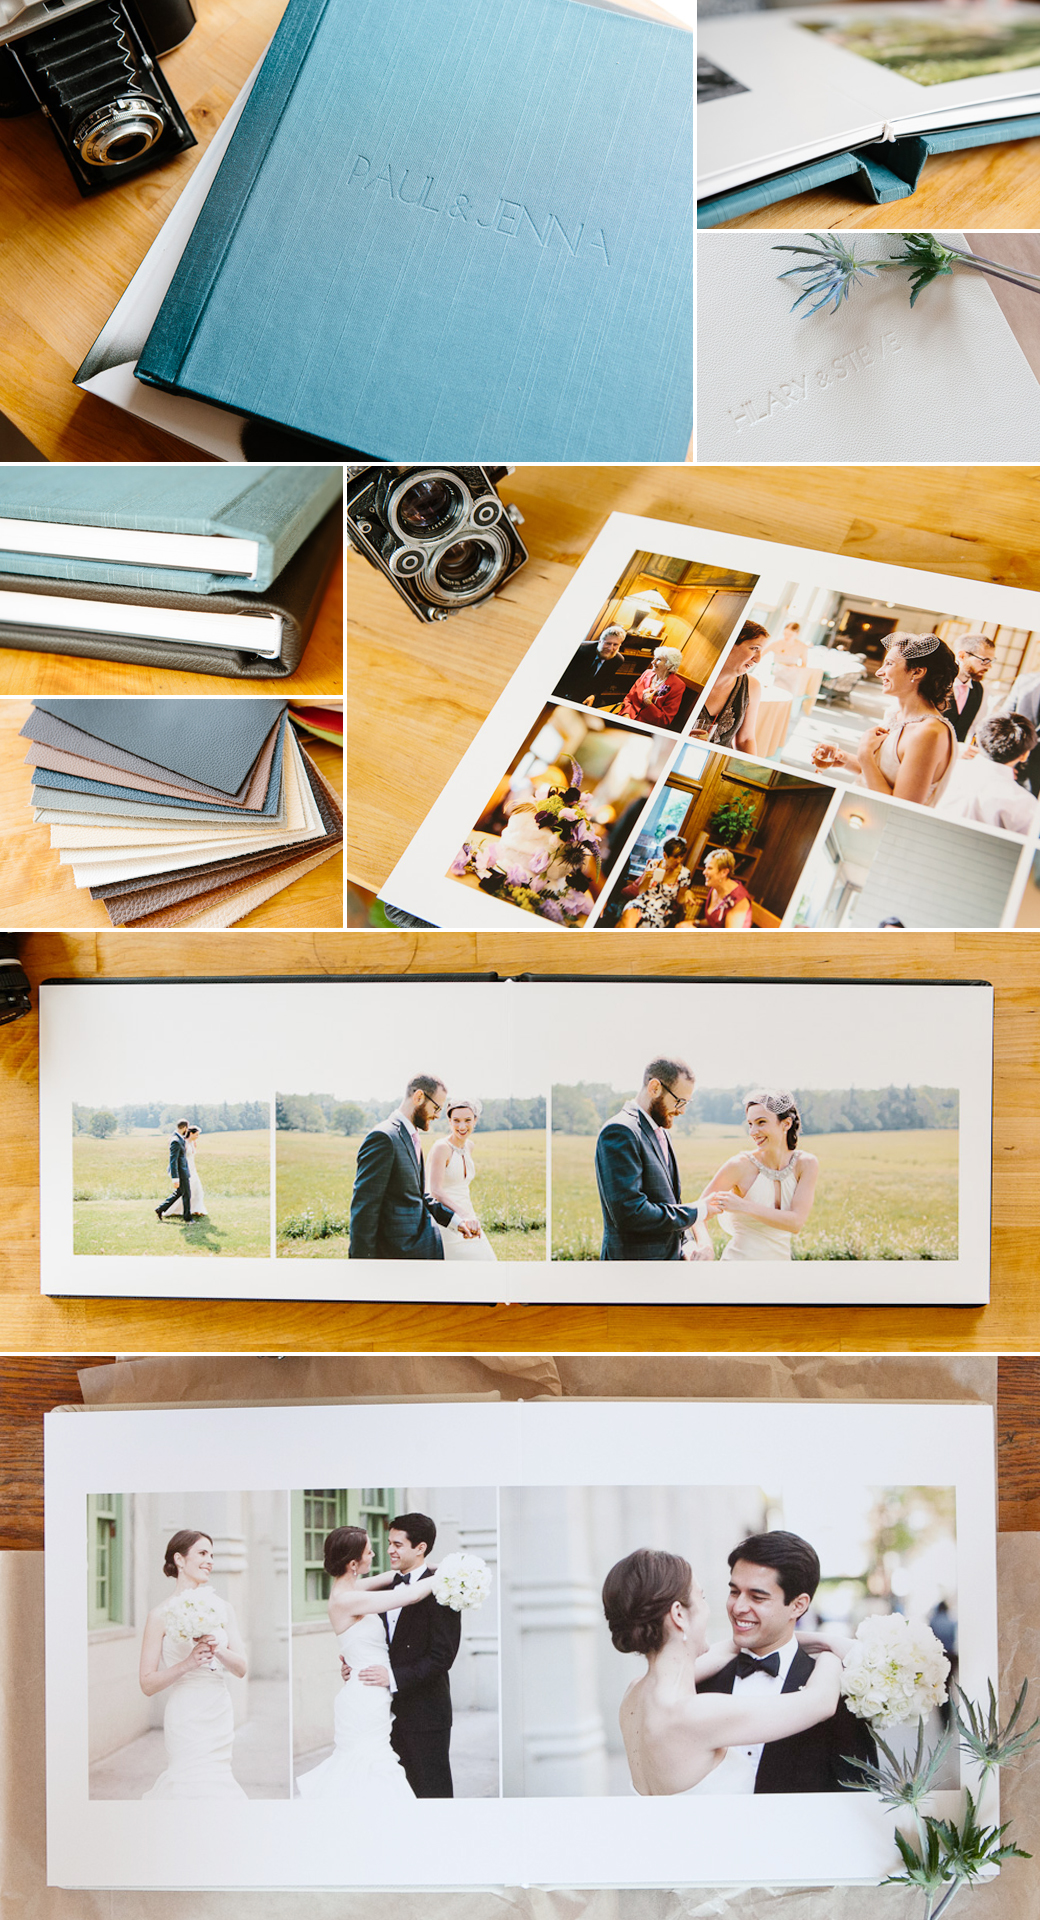 wedding-albums-collage-2.jpg